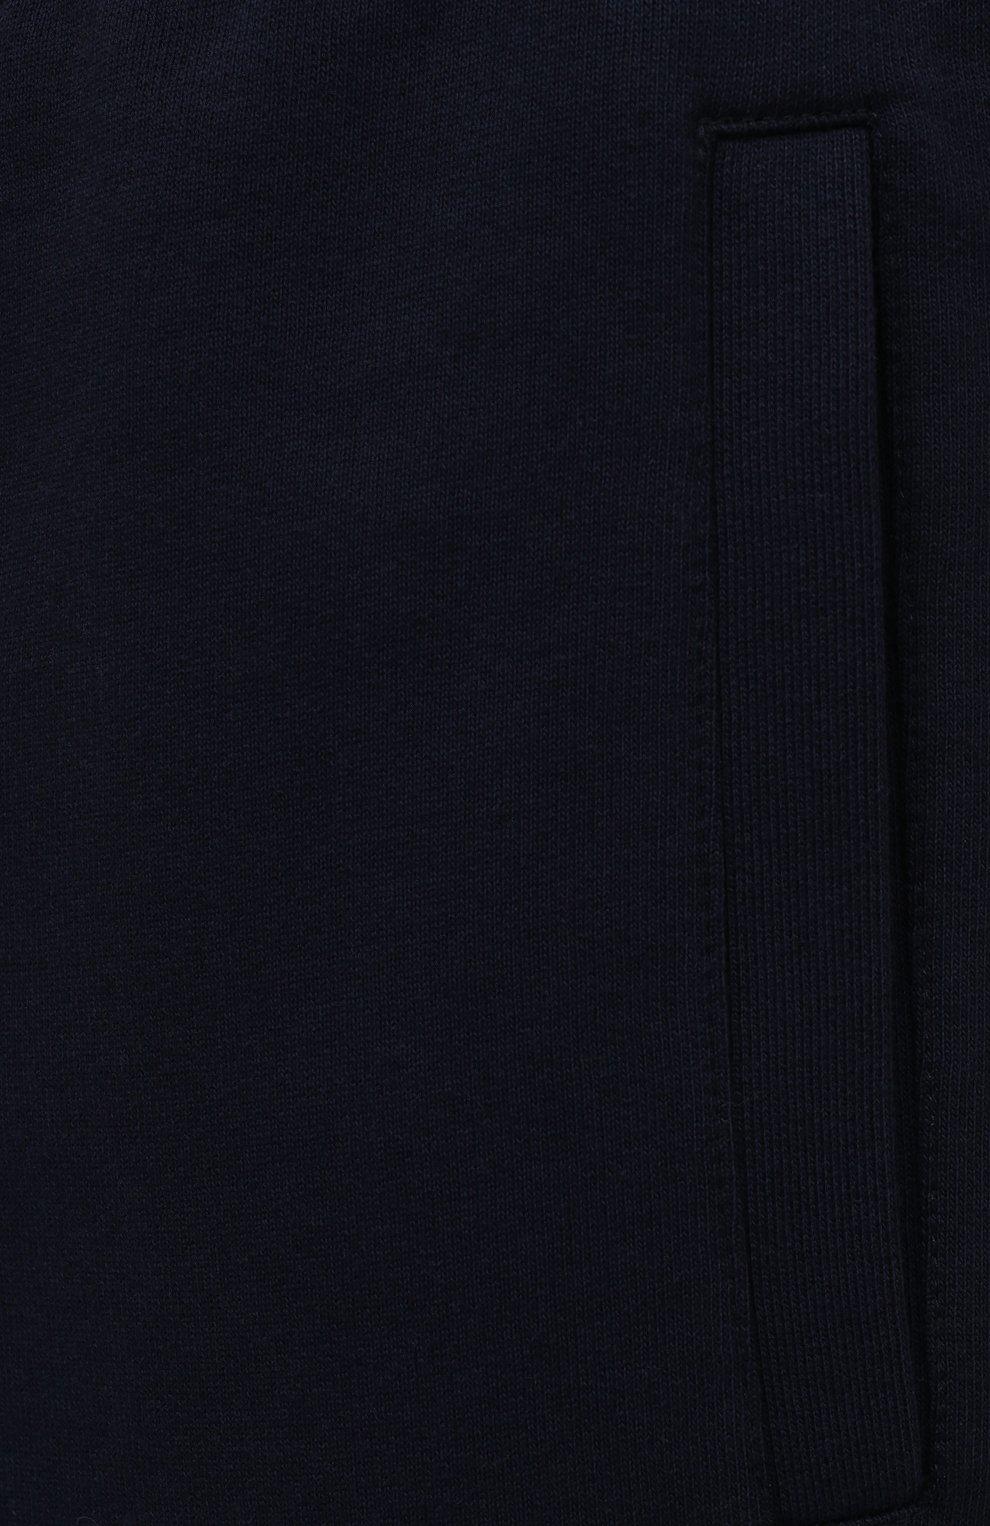 Мужские хлопковые брюки BRIONI темно-синего цвета, арт. UJDJ0L/P0637 | Фото 5